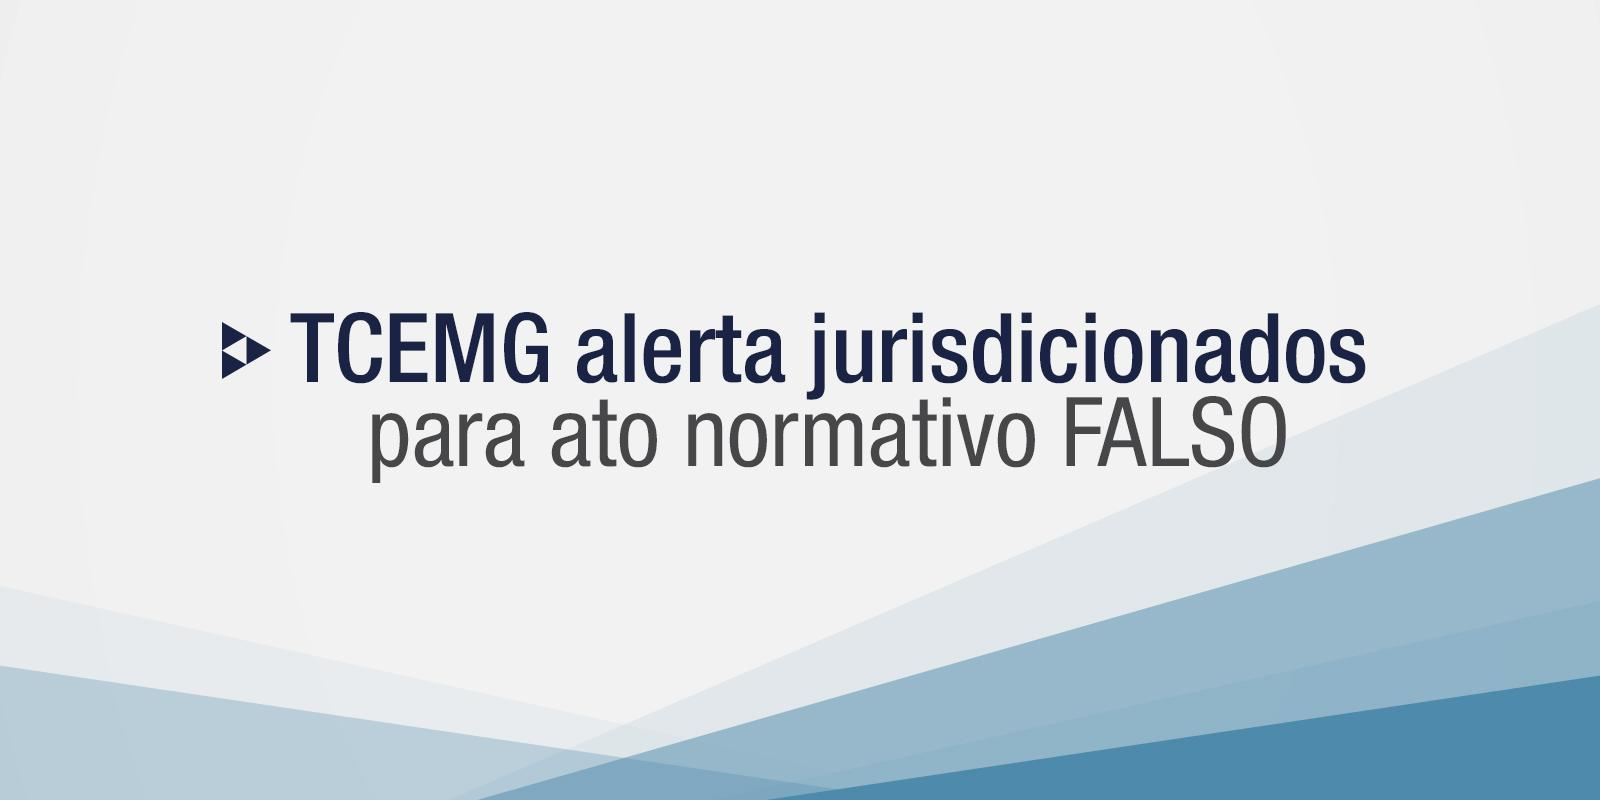 TCEMG alerta jurisdicionados para ato normativo falso